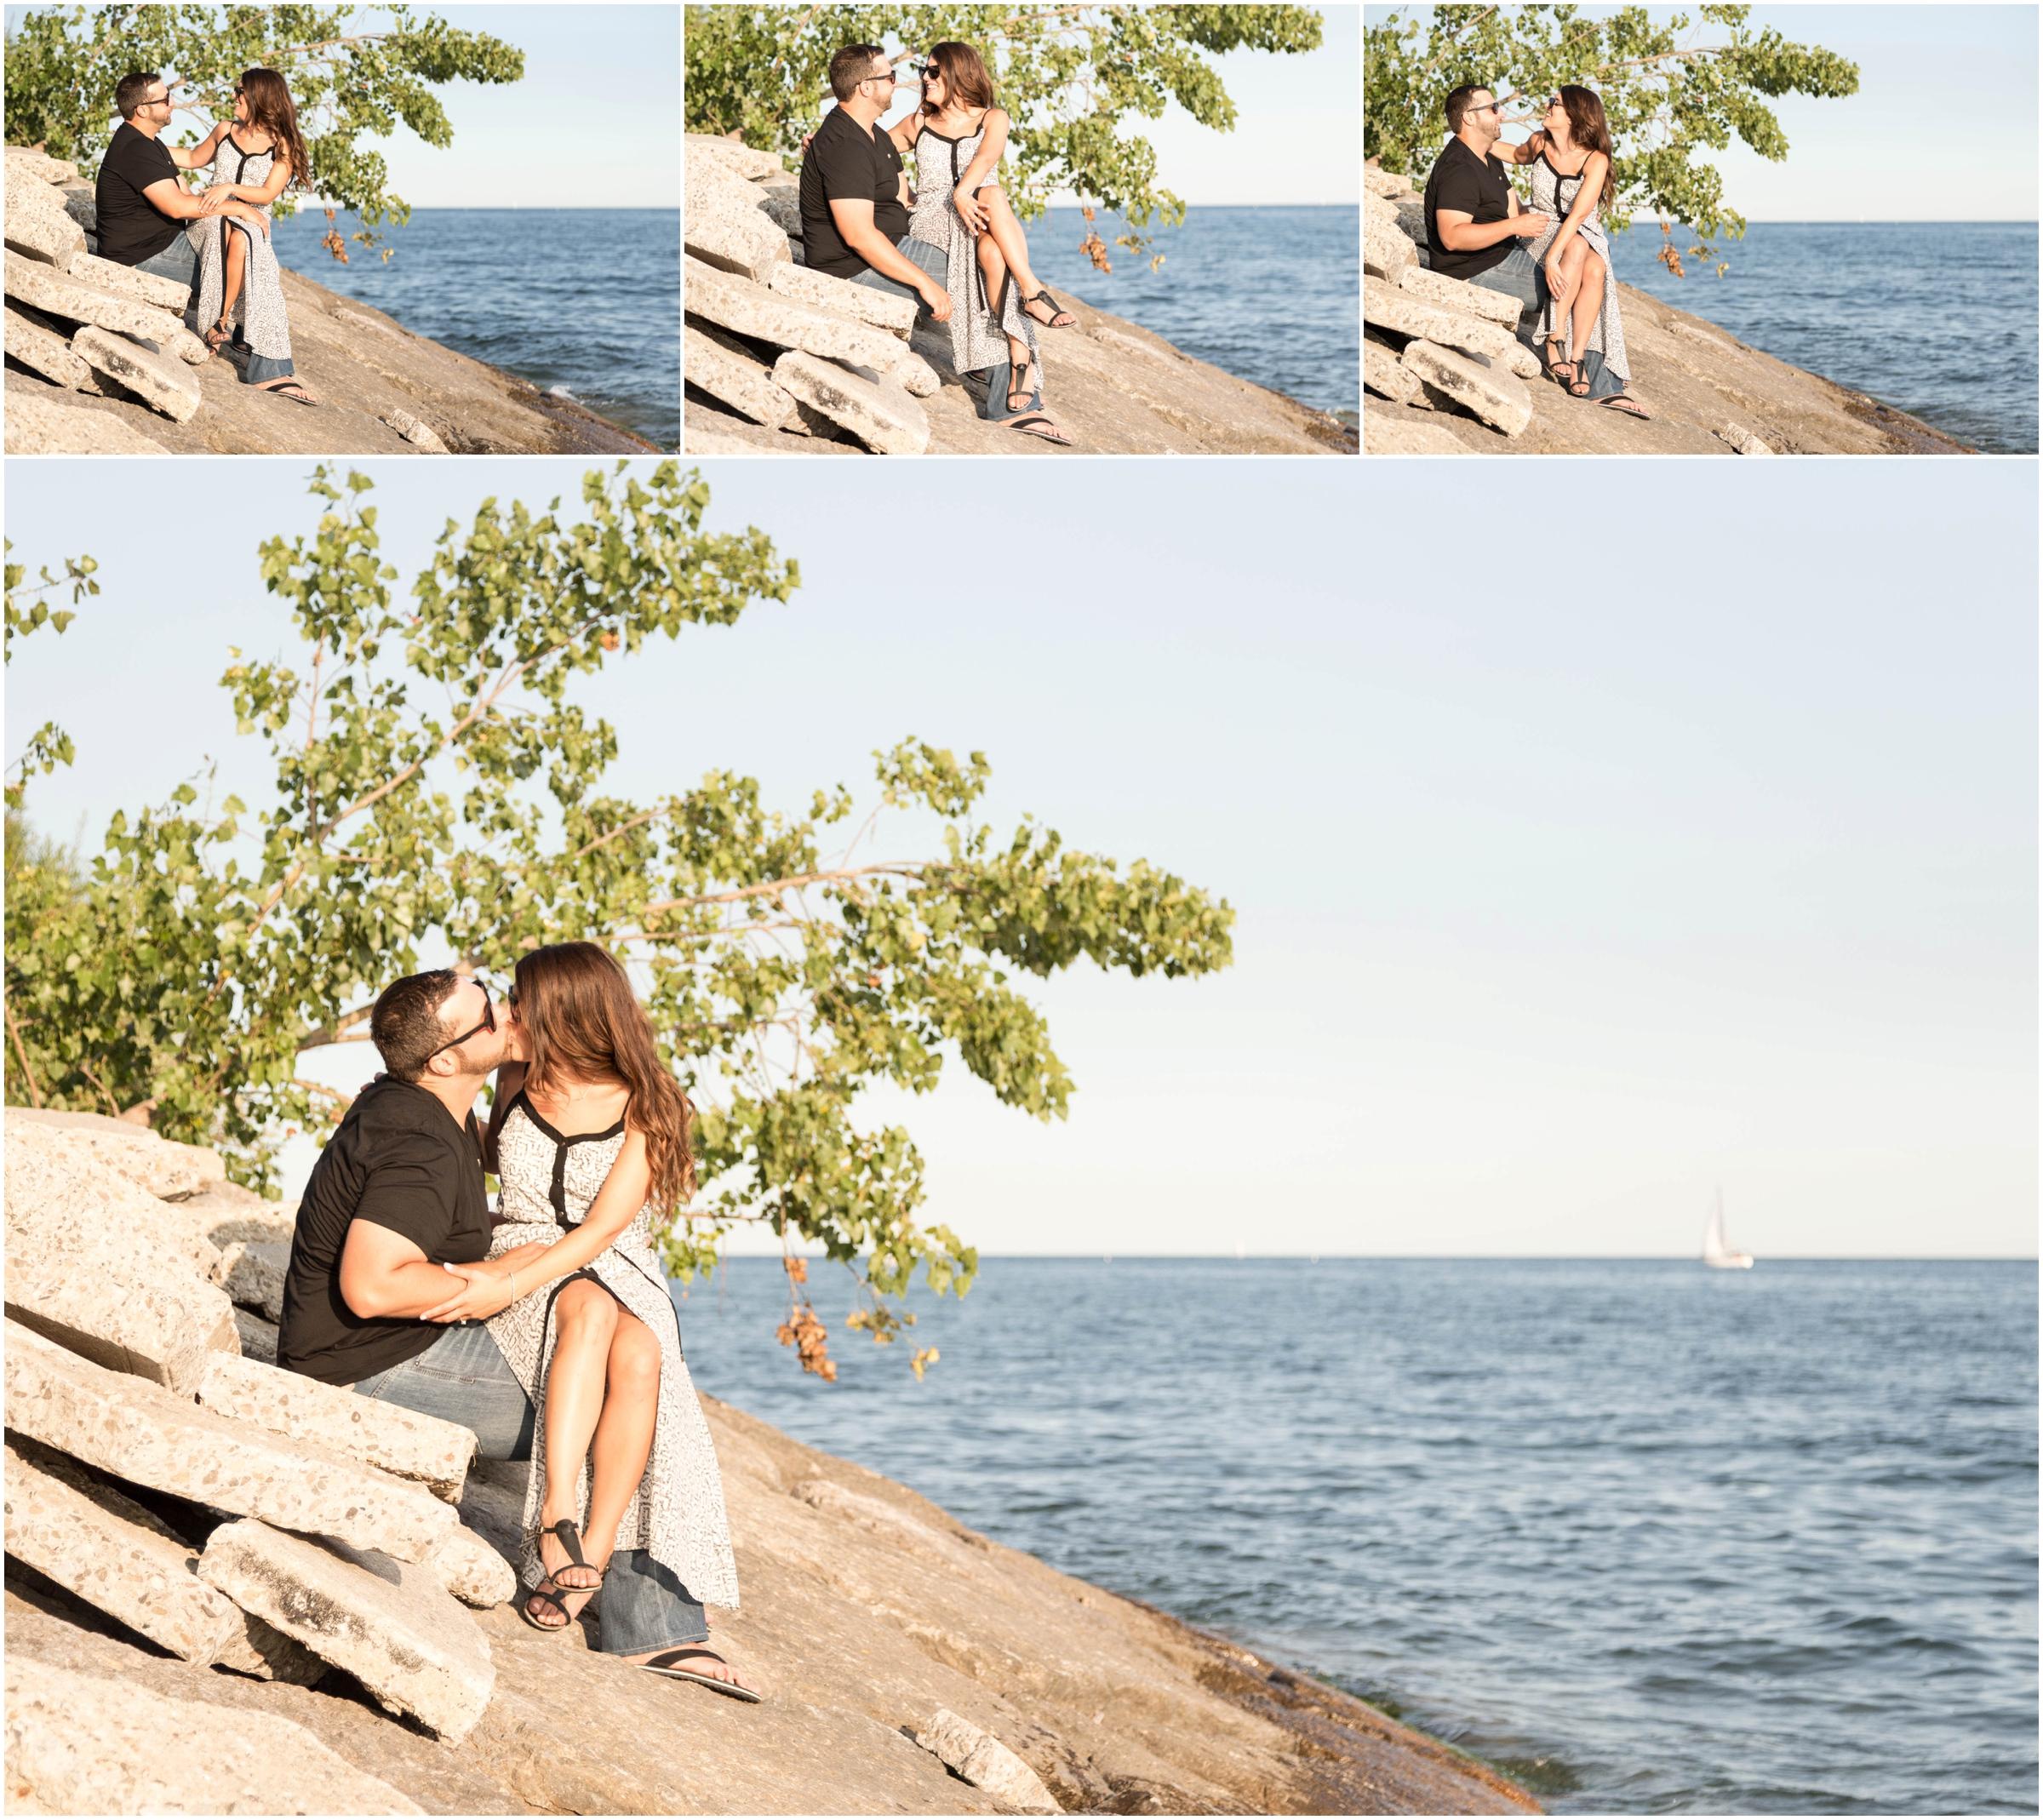 Cathy & Gianmarco 13.jpg